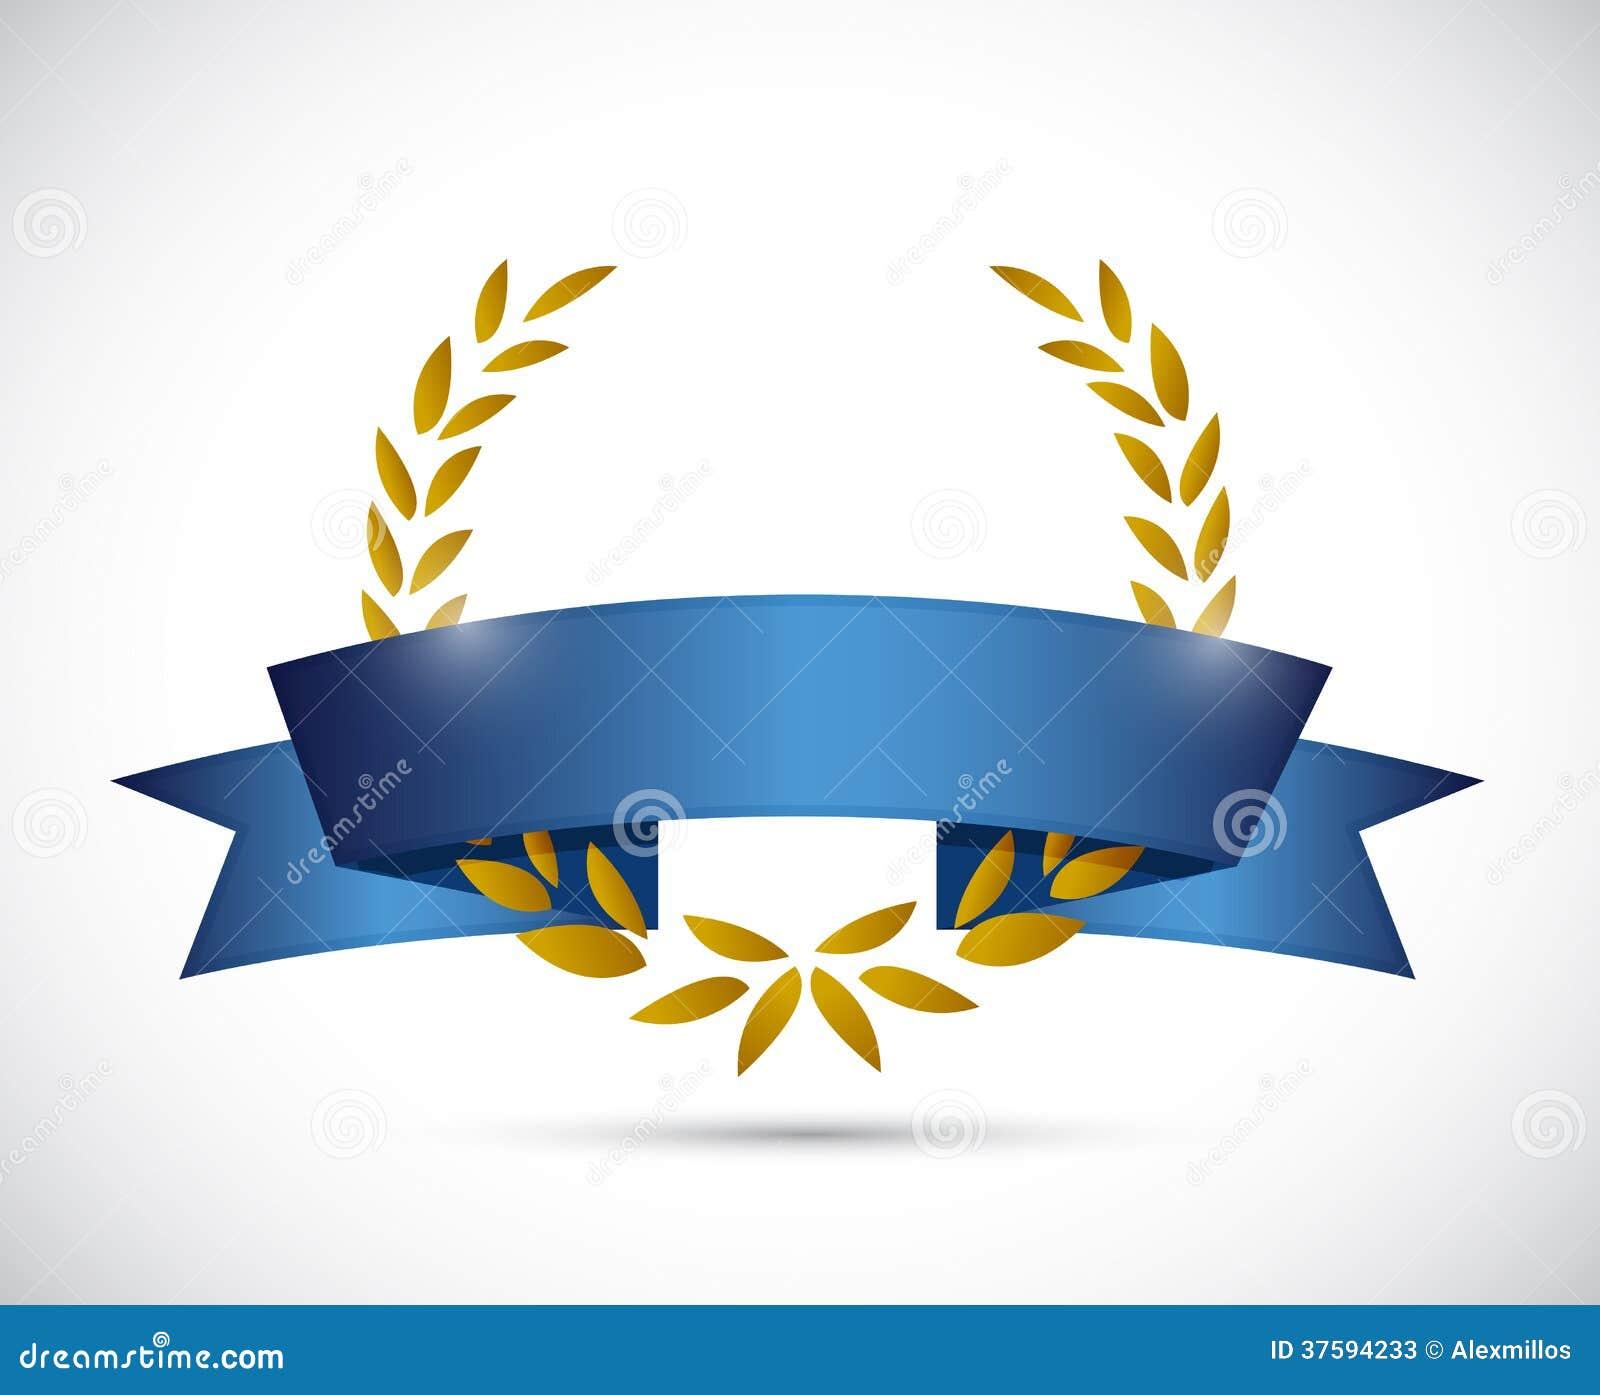 blue ribbons designs - Parfu kaptanband co